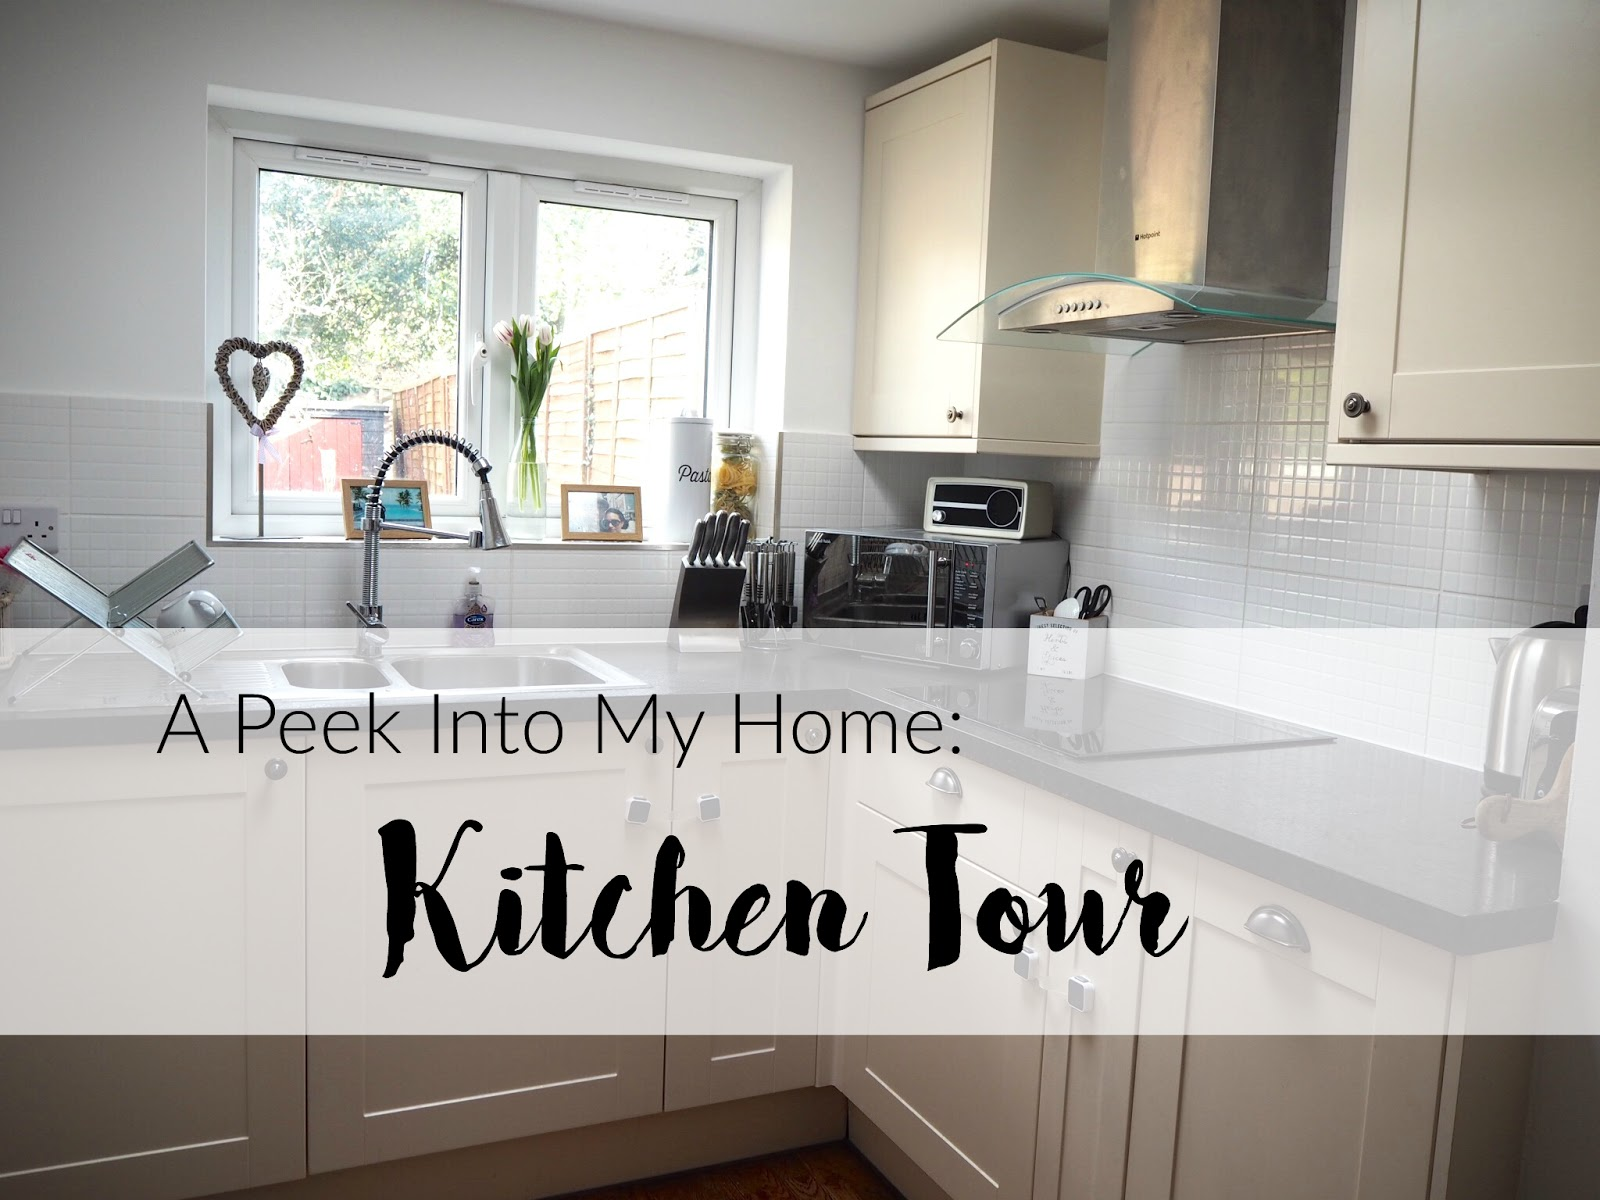 A Peek Into My Home: Kitchen Tour - Eat.Love.Live